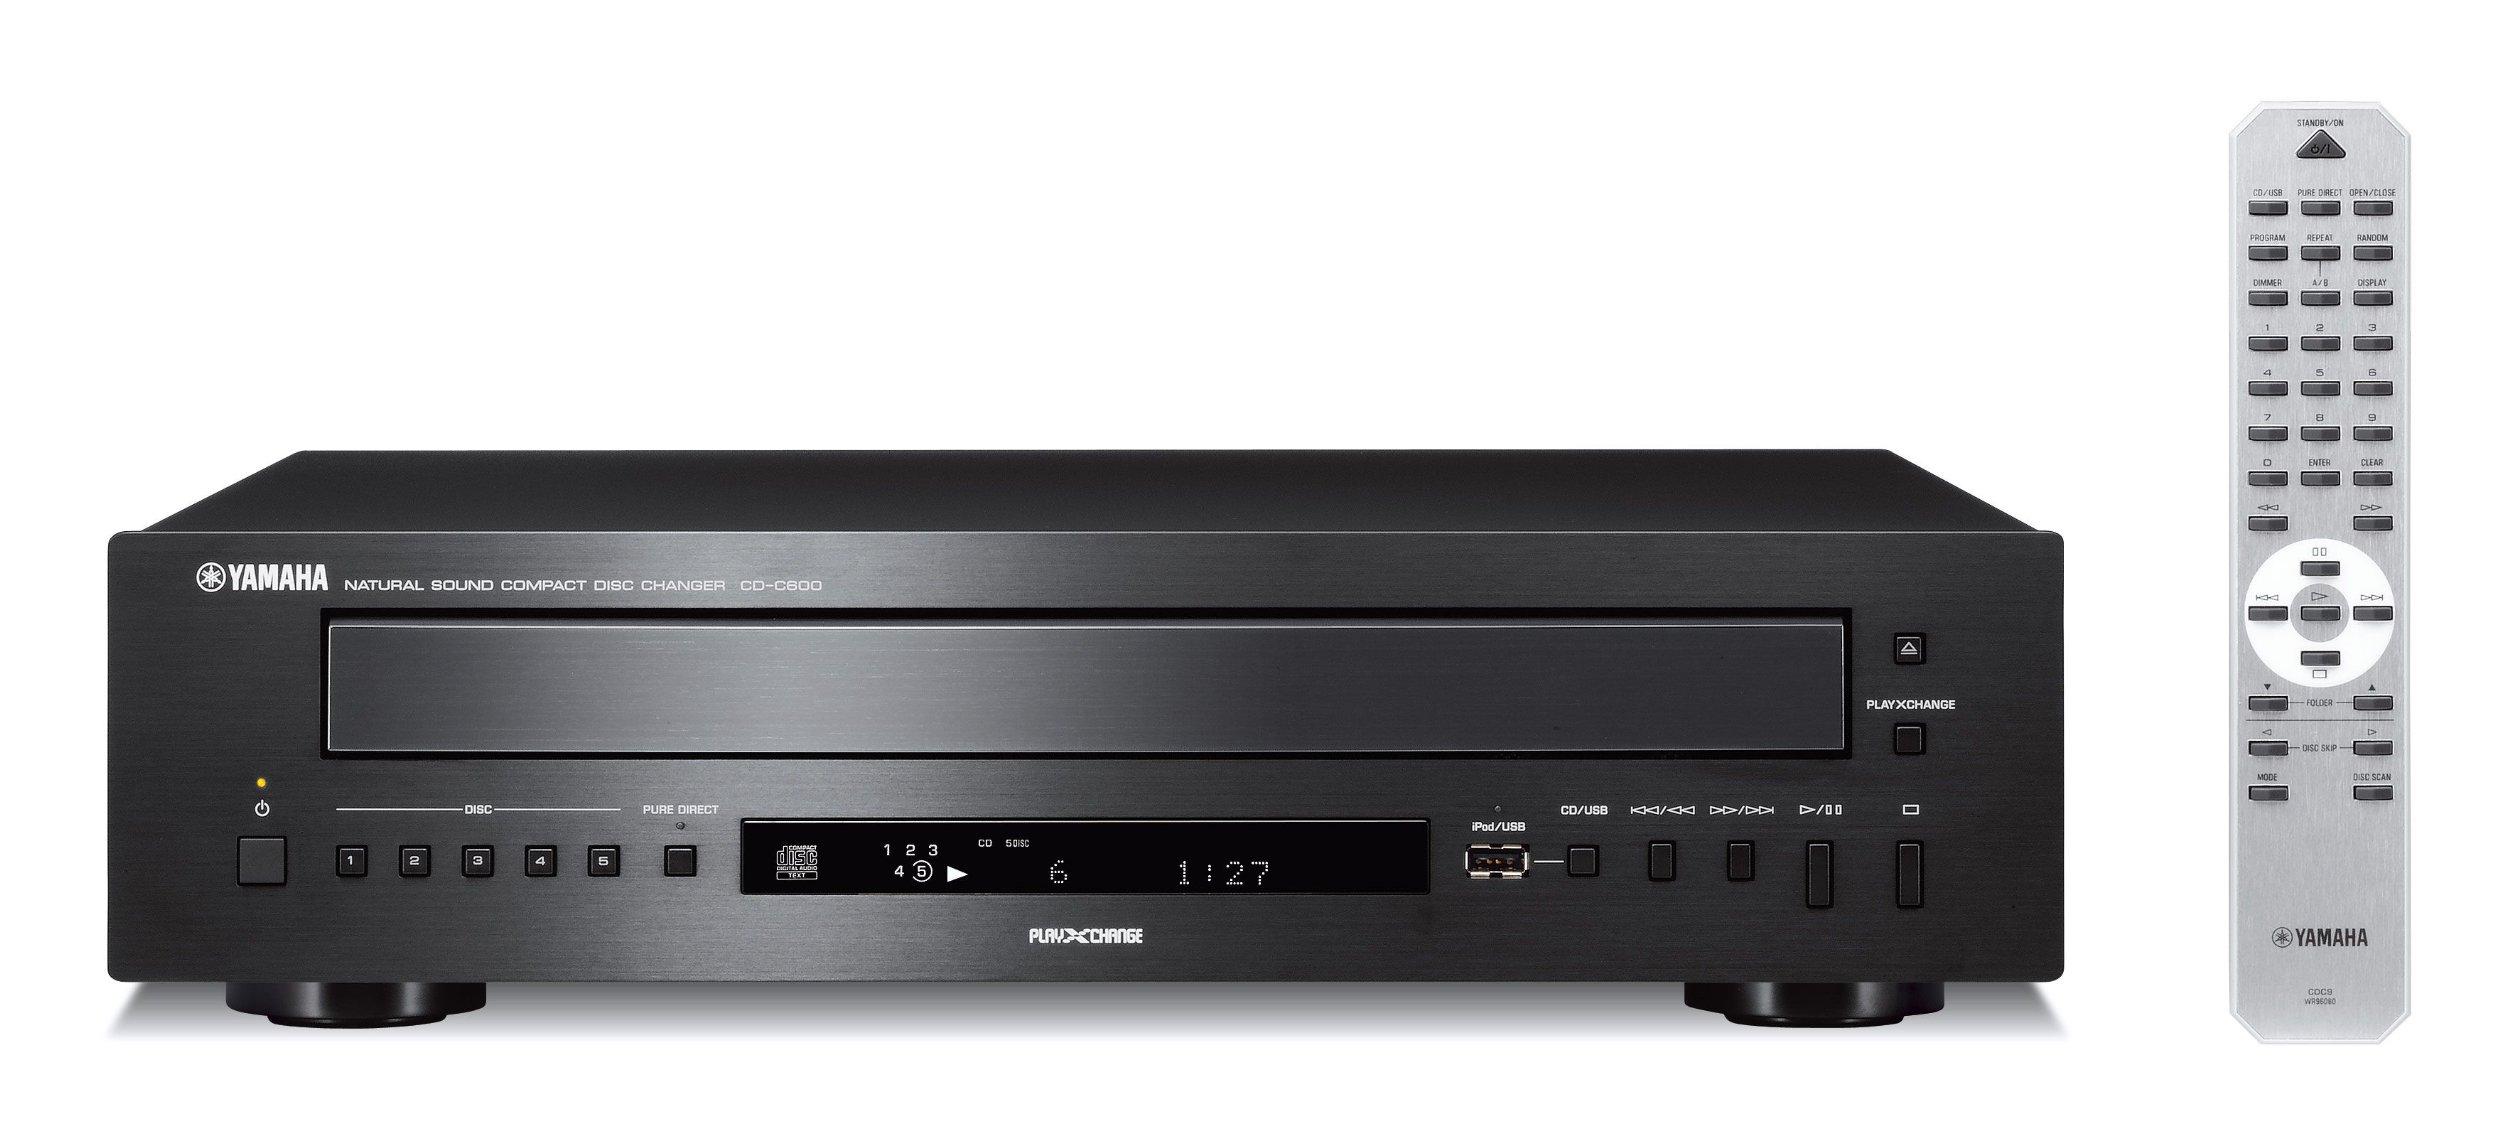 Yamaha Cd-c600bl 5-disc Cd Changer Black, 2.6 Lb by Yamaha Audio